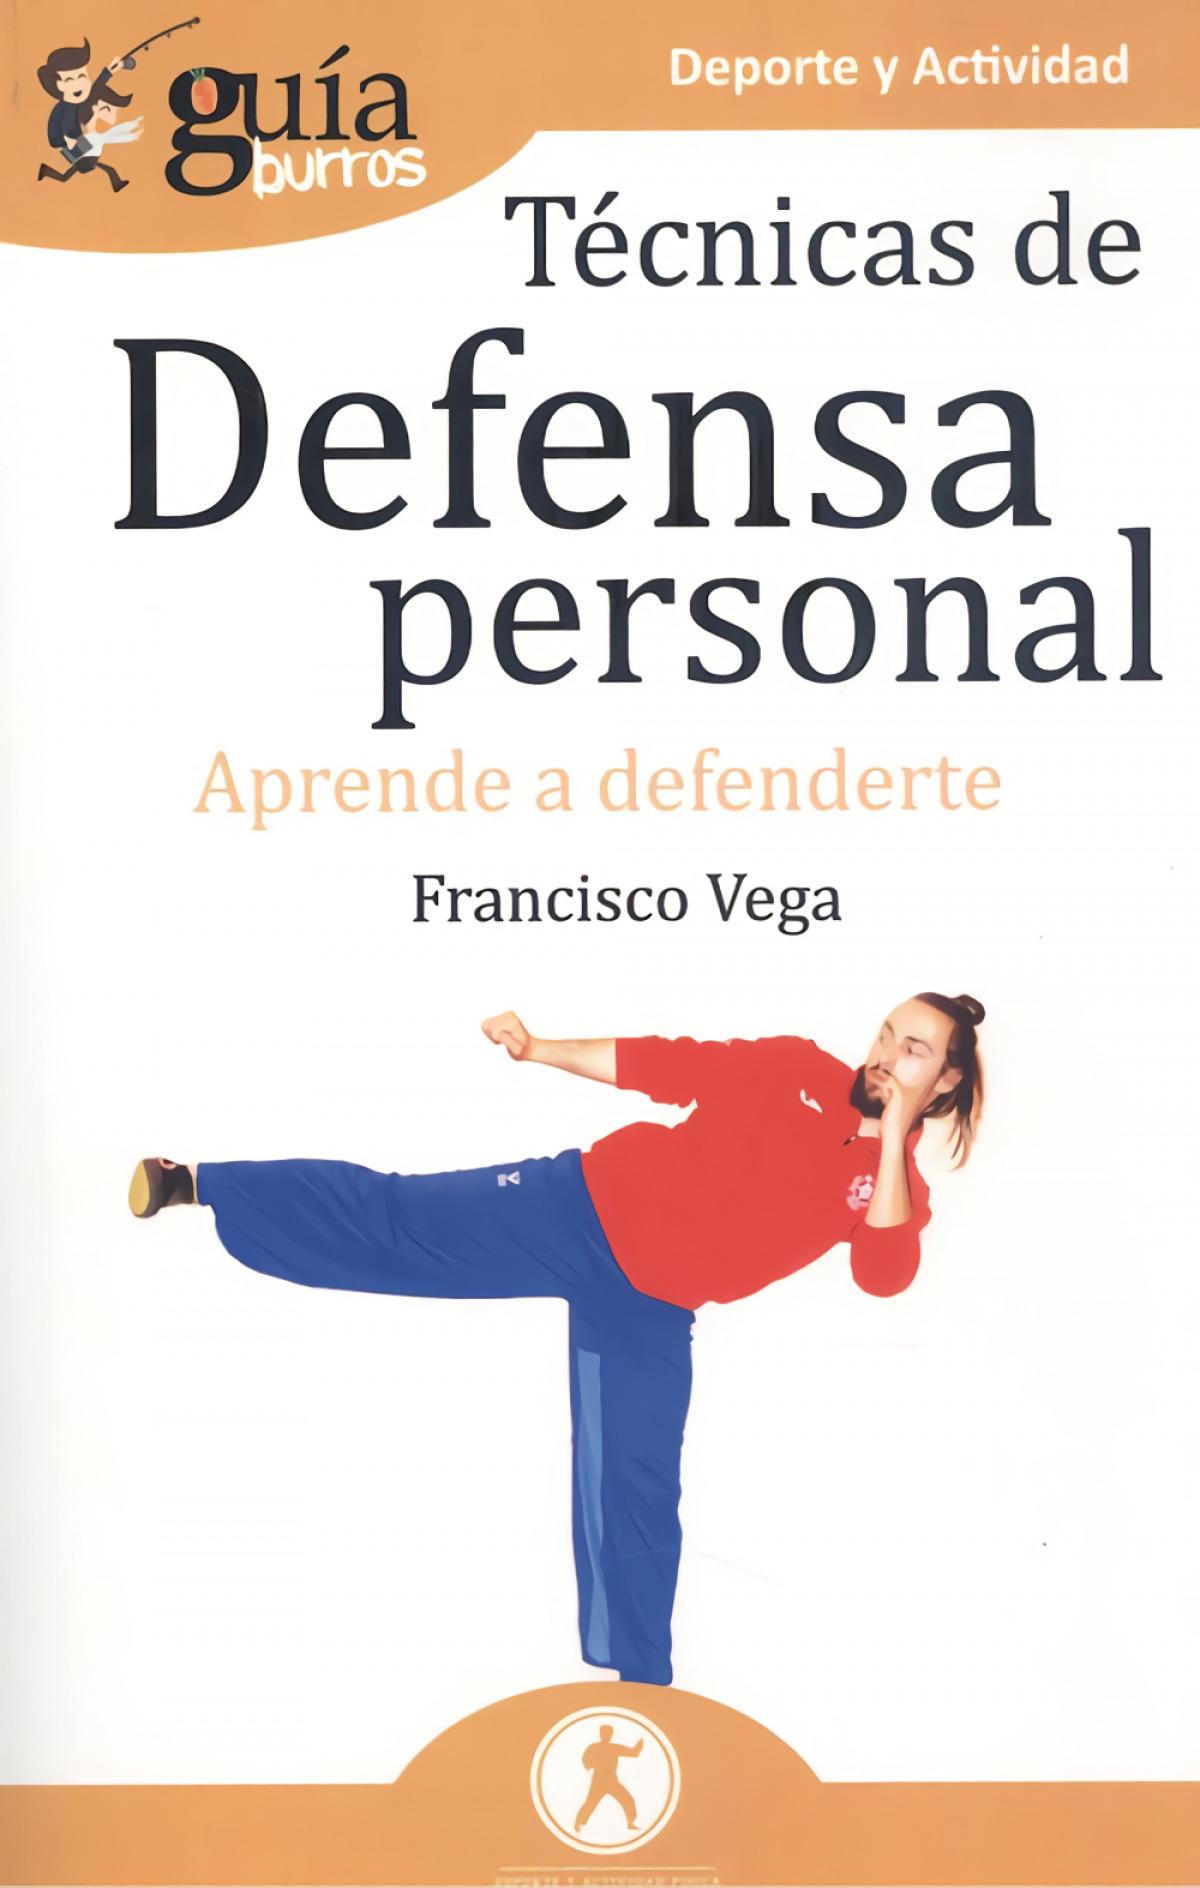 Gu¡aBurros Técnicas de defensa personal 9788418121258